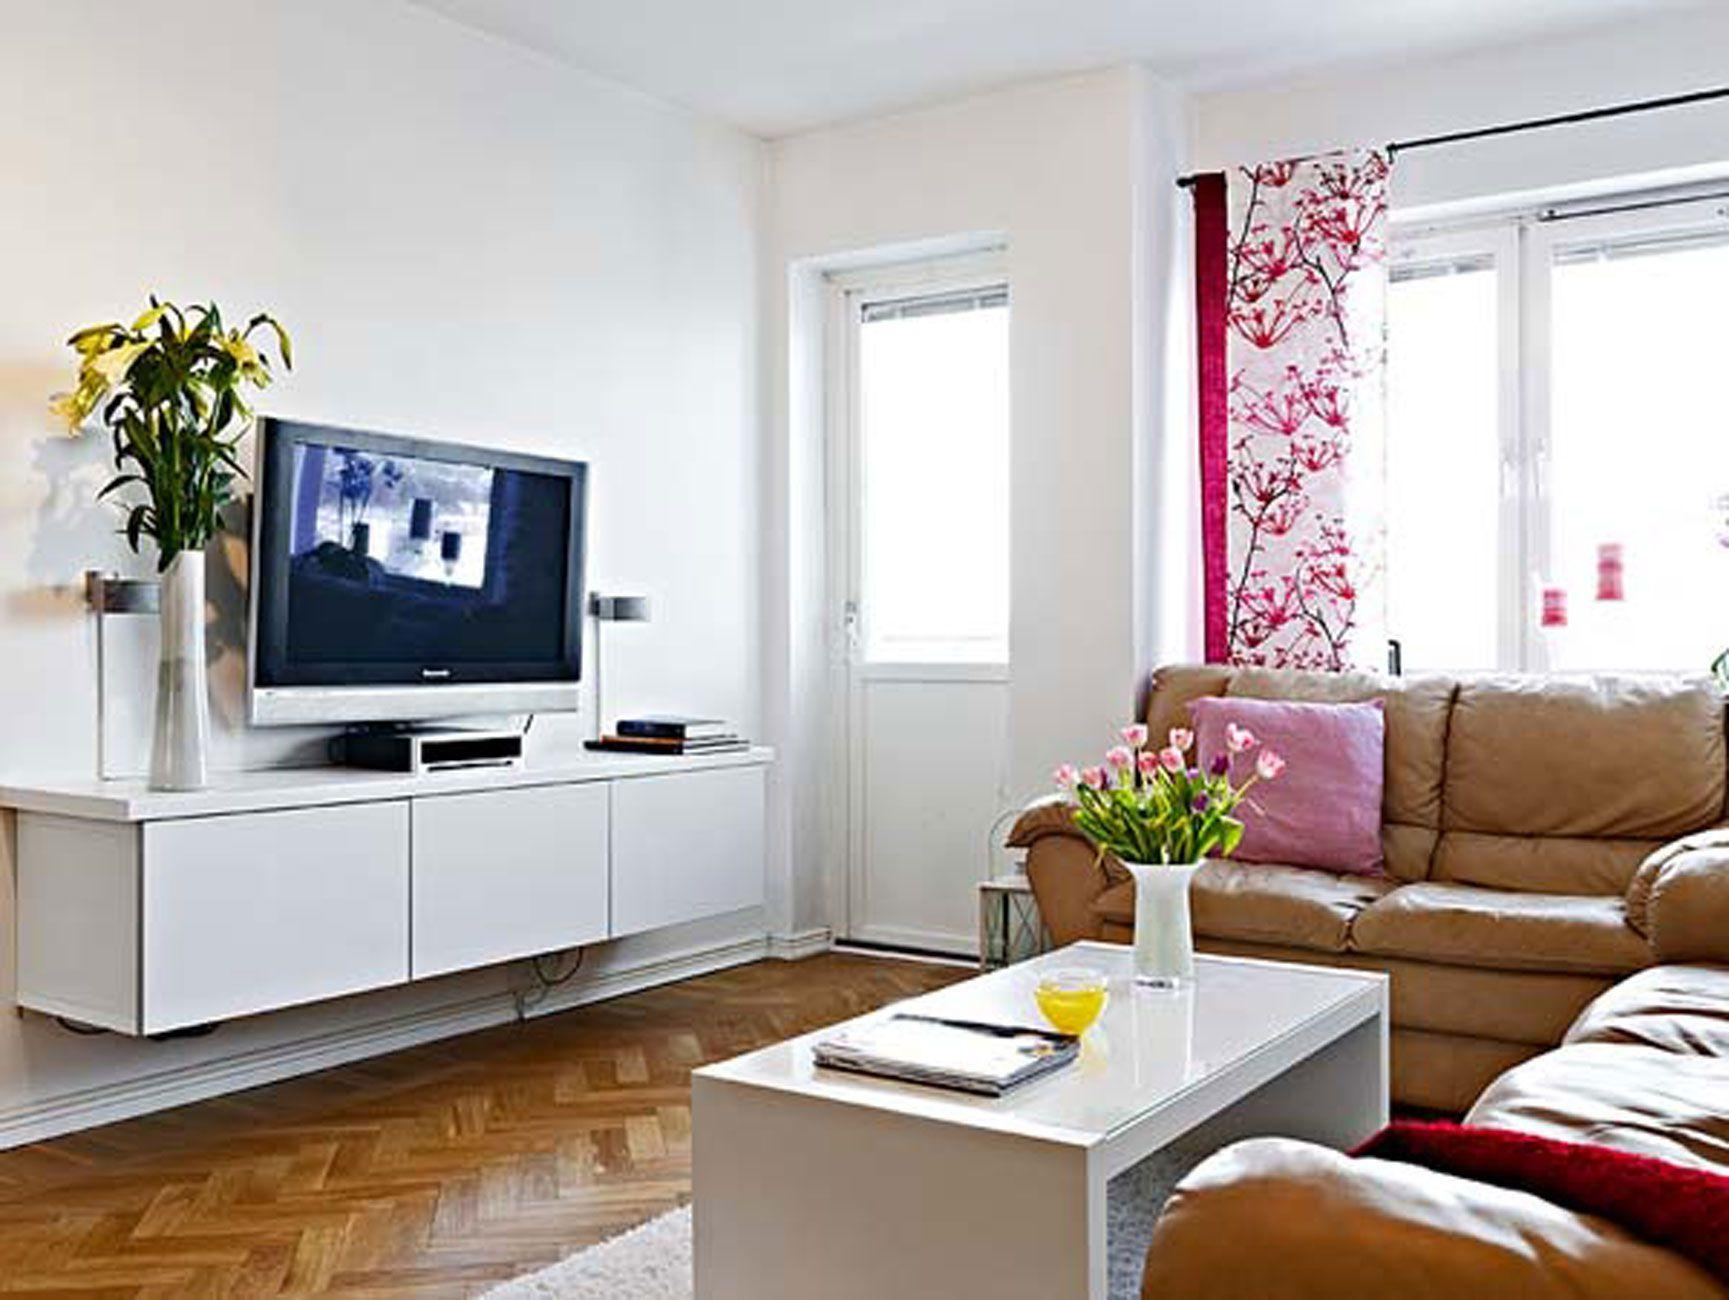 Living Room : Bernhardt Tarleton Sofa Fuschia Throw Pillow Round Within Bernhardt Tarleton Sofas (View 20 of 20)